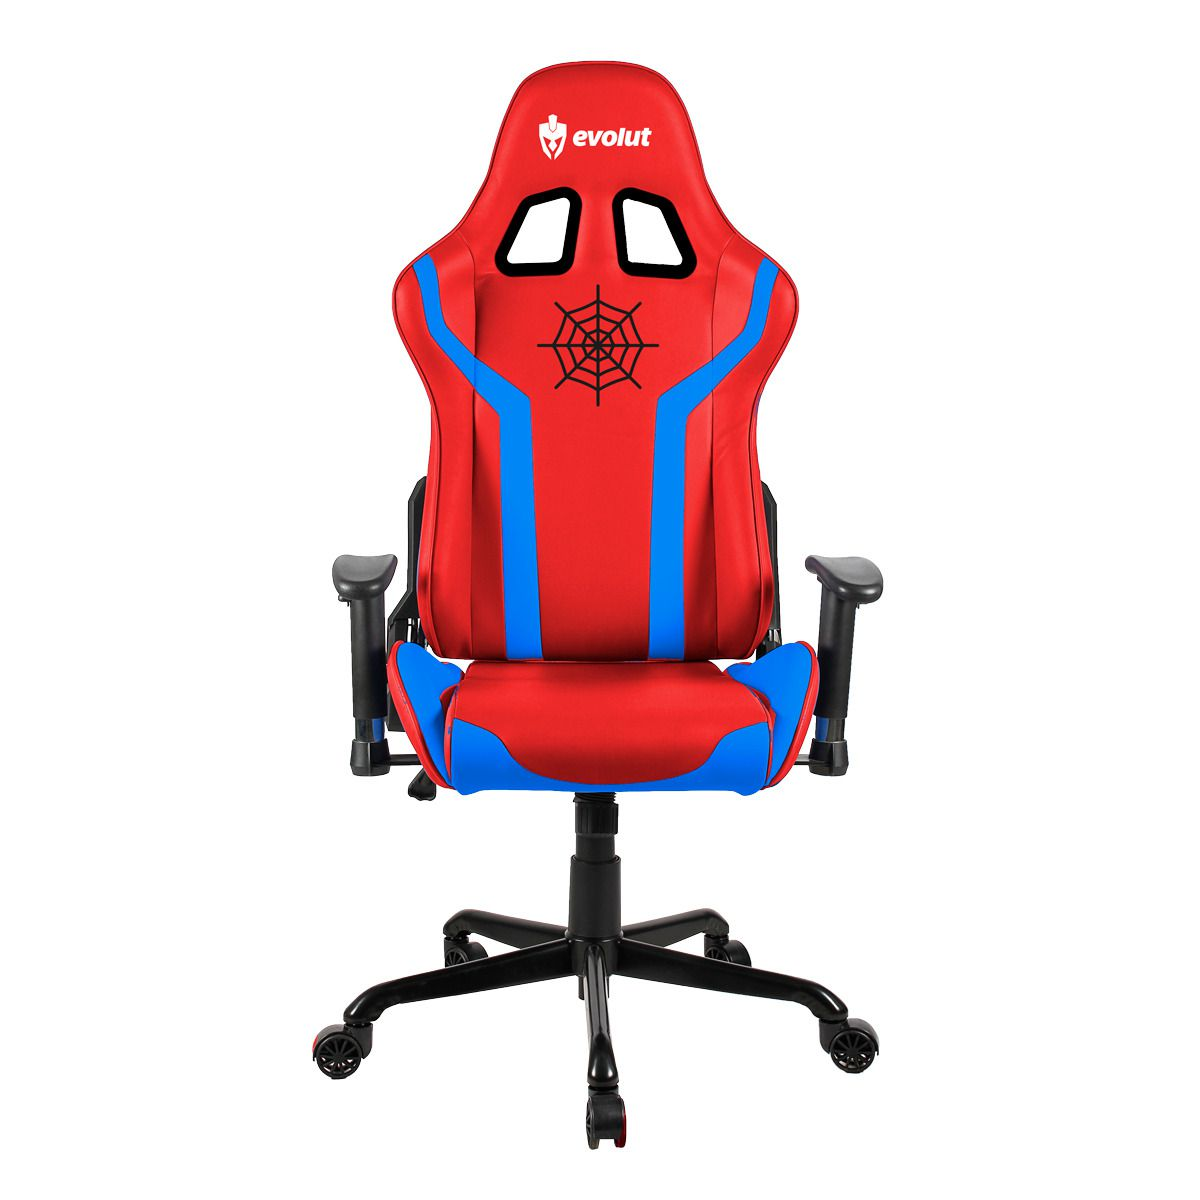 Cadeira Gamer Evolut Eg 920 Homem Aranha Spiderman Evolut